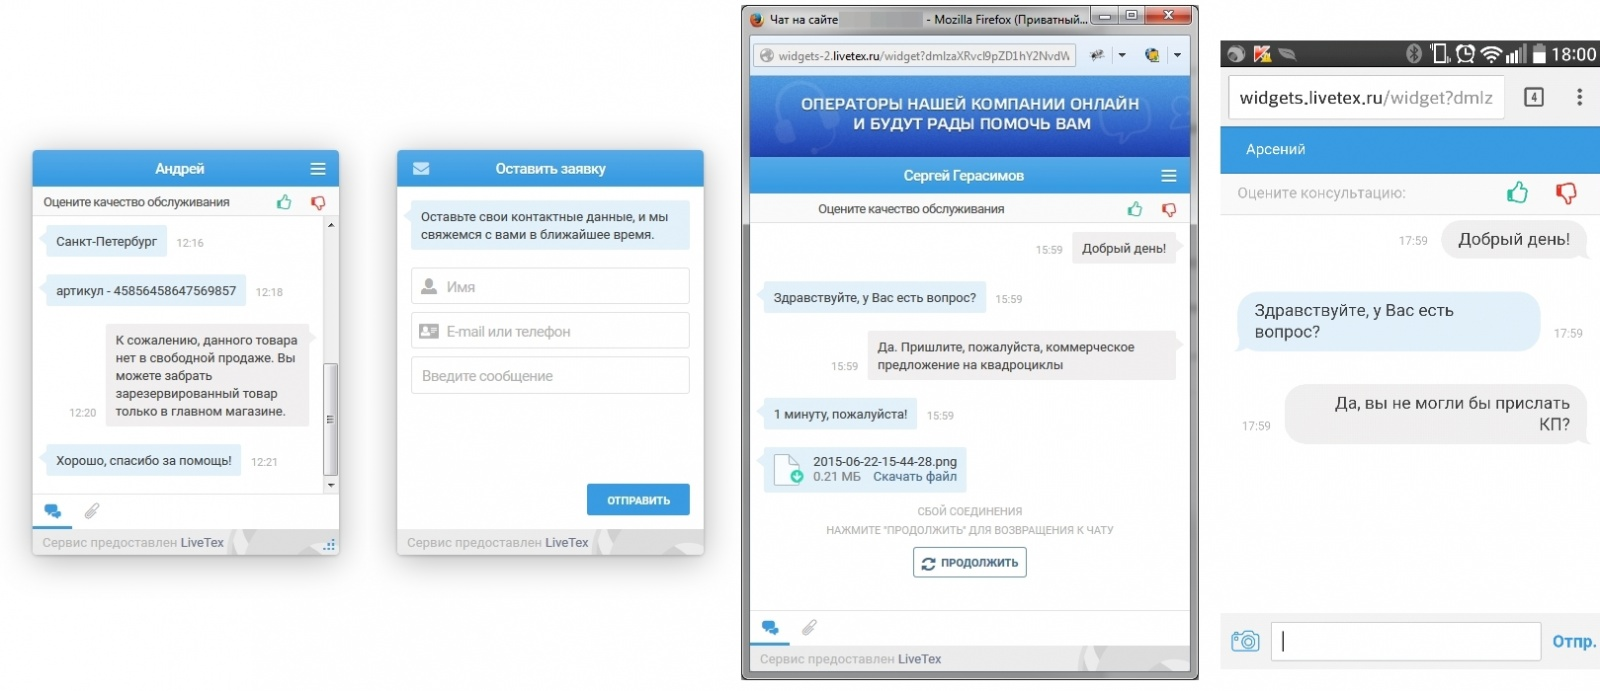 Онлайн-консультанты — обзор ТОП-сервисов: RedHelper, Livetex, Jivosite, Onicon - 7